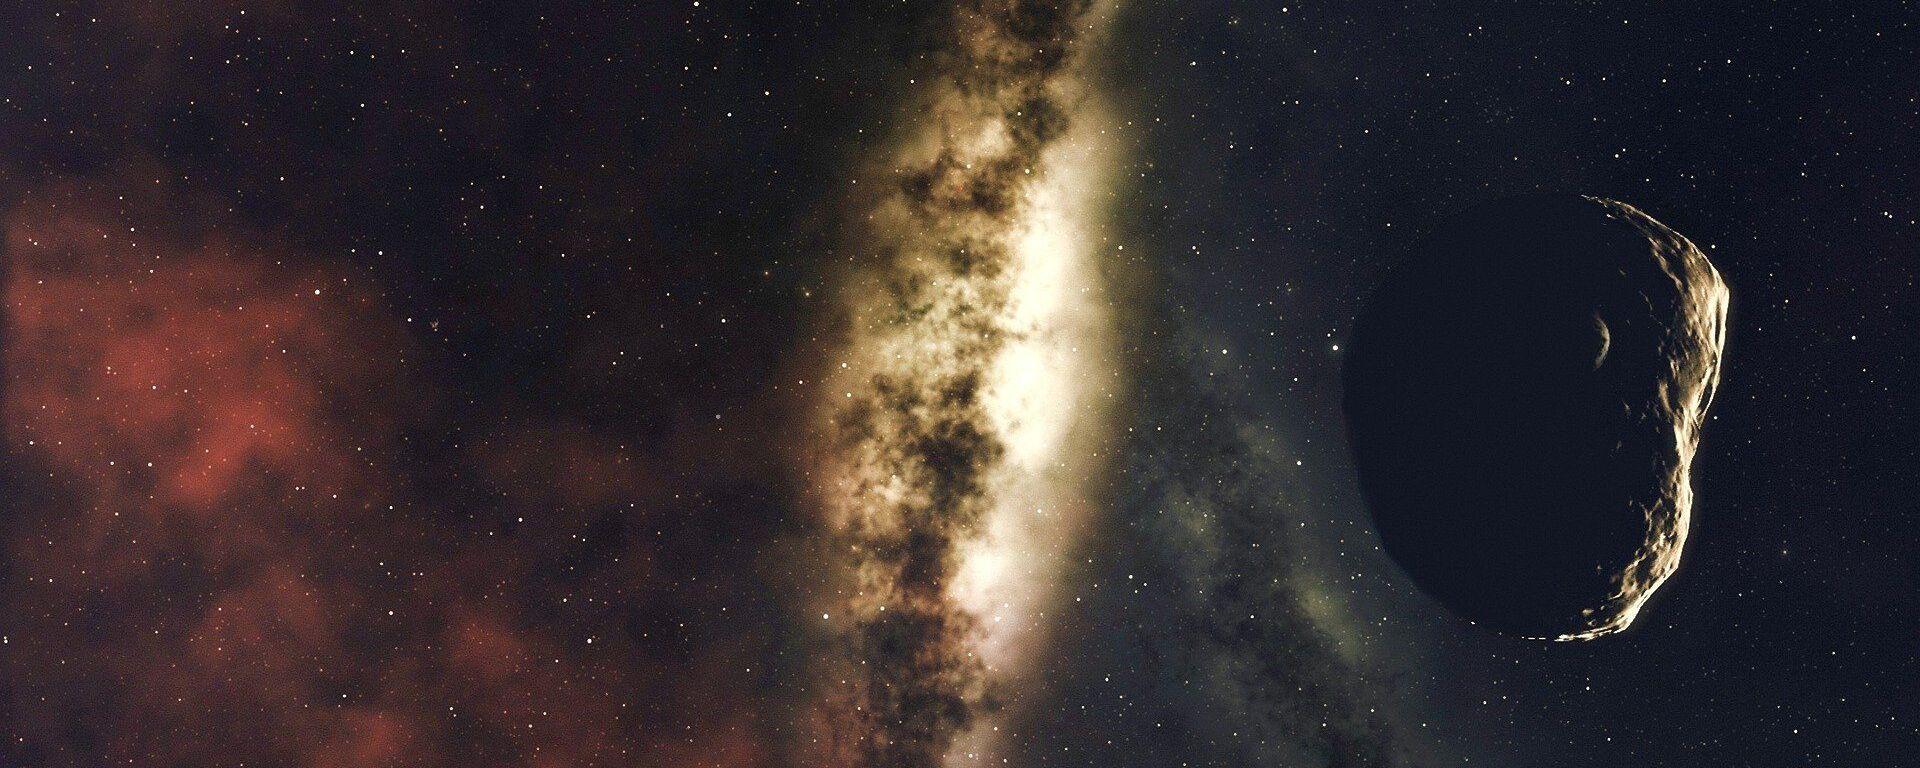 Asteroide intergalattico - Sputnik Italia, 1920, 27.03.2021